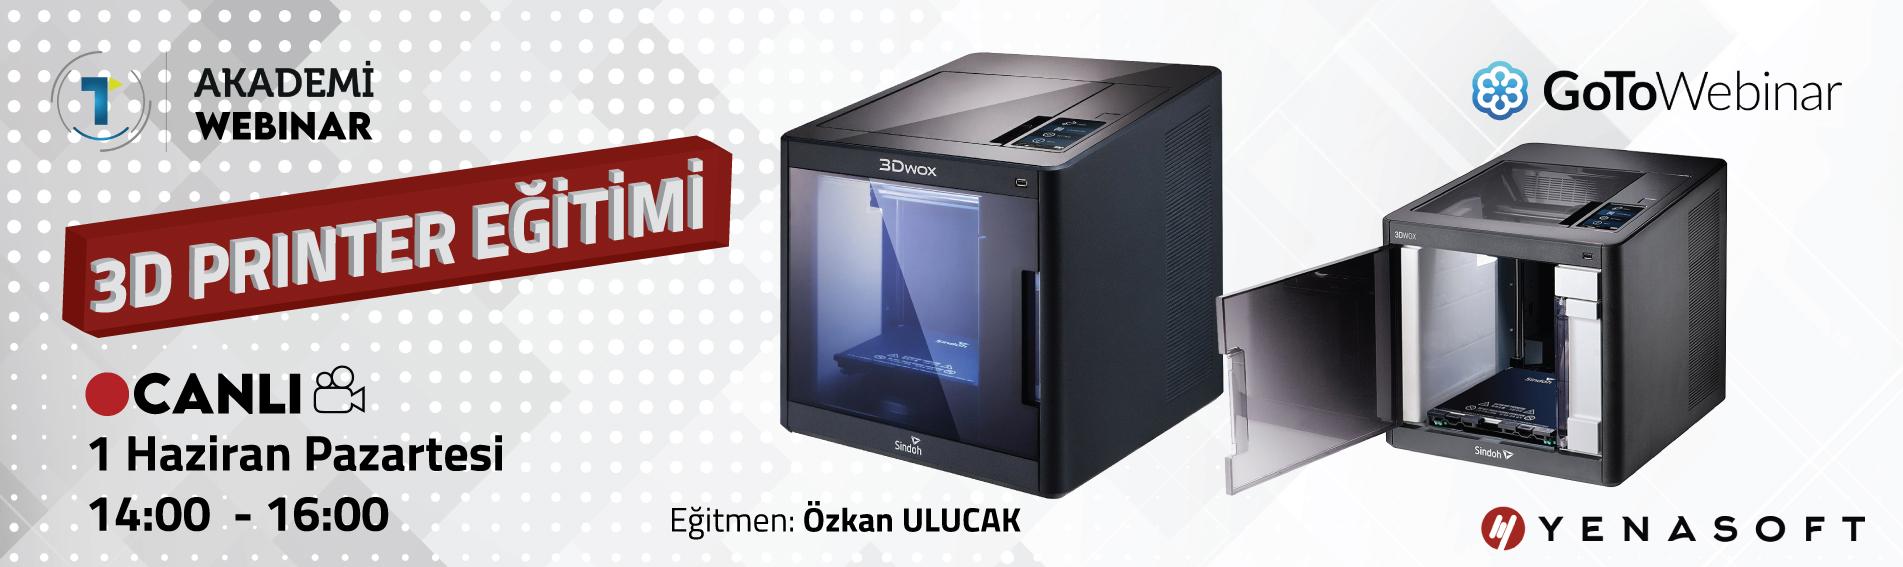 3D Printer Eğitimi 1 Haziran